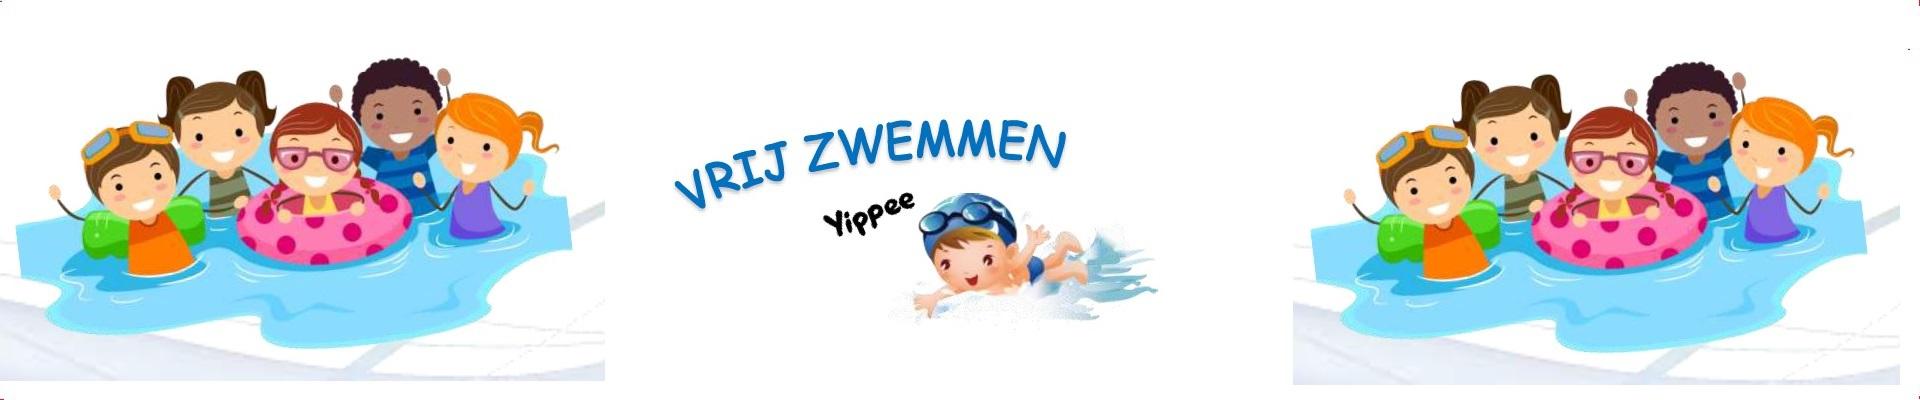 vrij_zwemmen